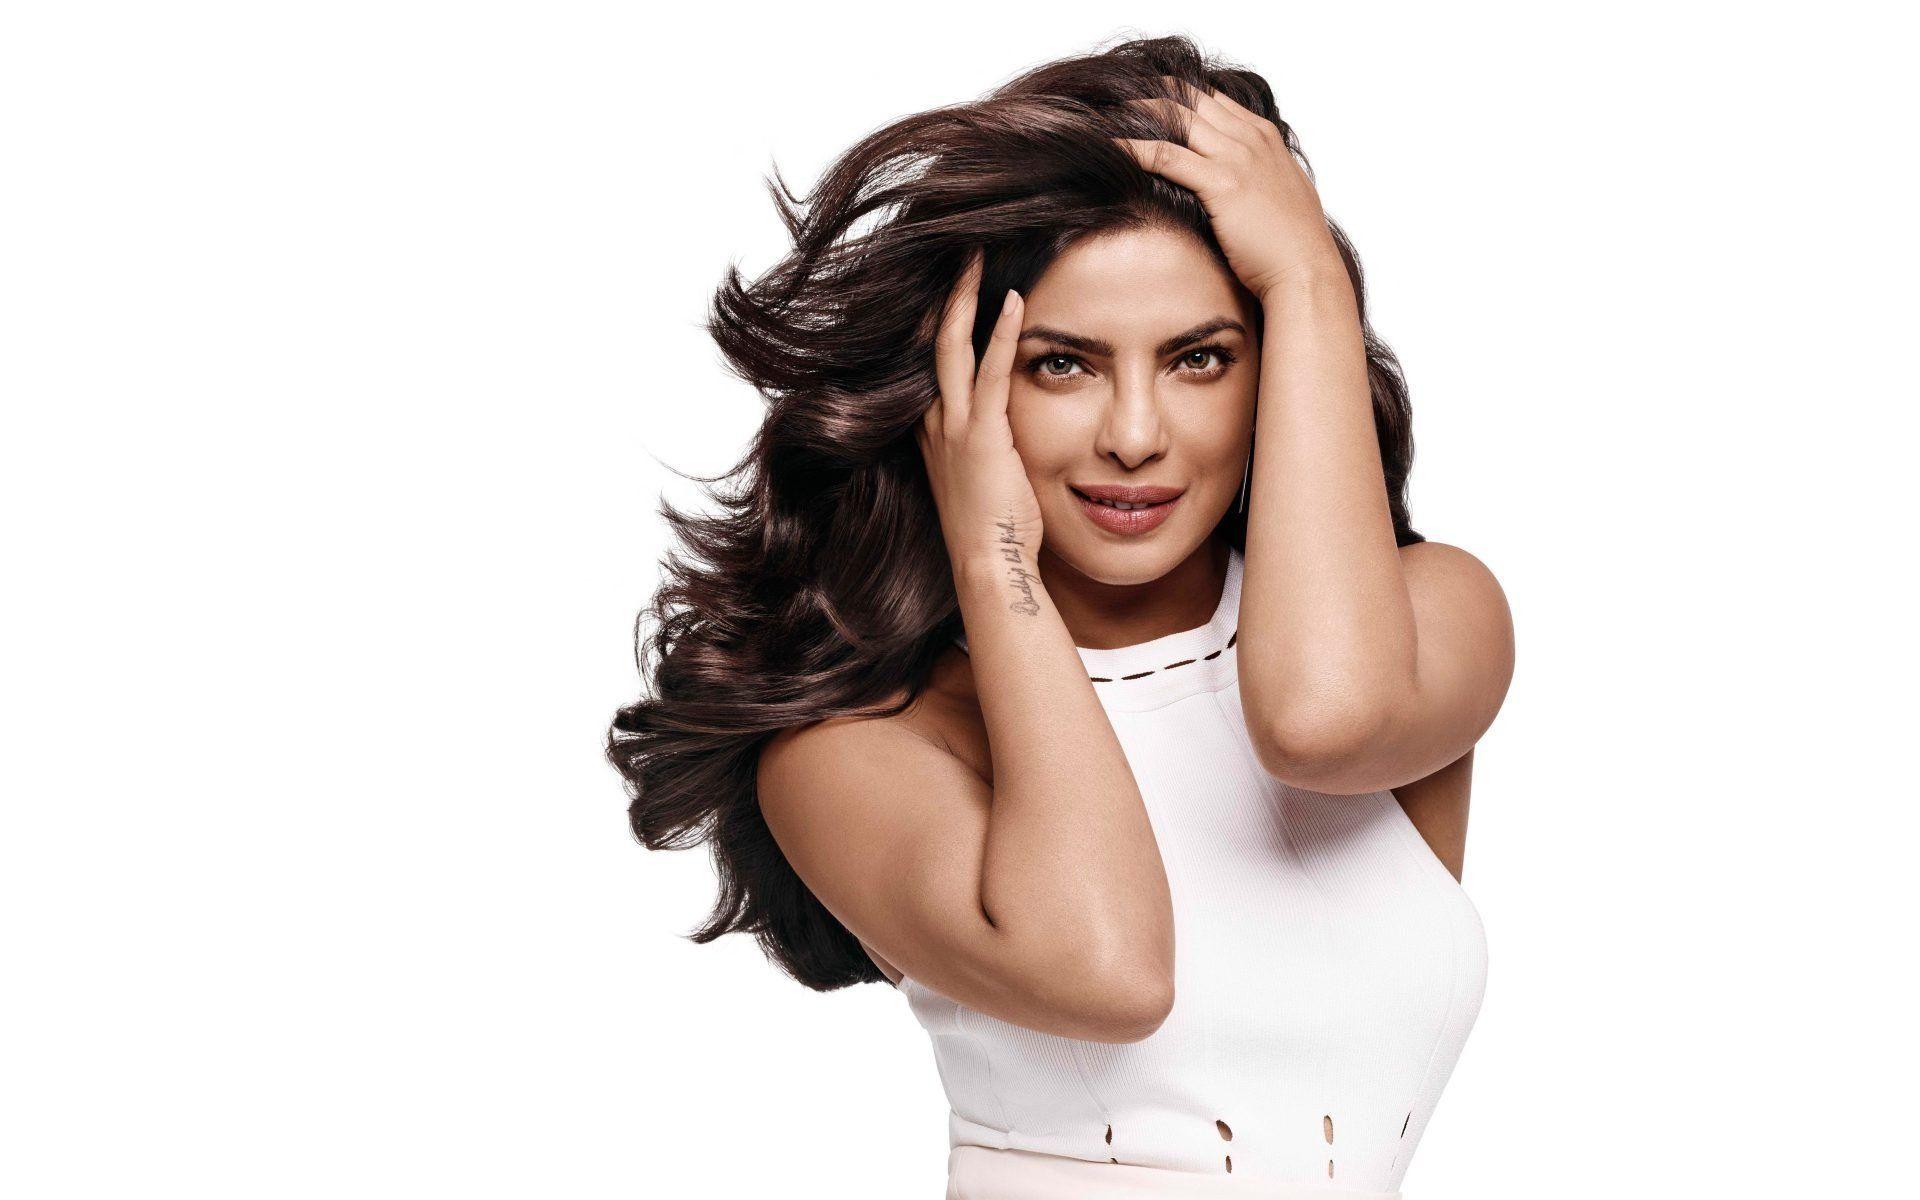 Actress Priyanka Chopra White Costume Gorgeous Actress Wallpaper In 2020 Actress Priyanka Chopra Priyanka Chopra Wallpaper Actresses